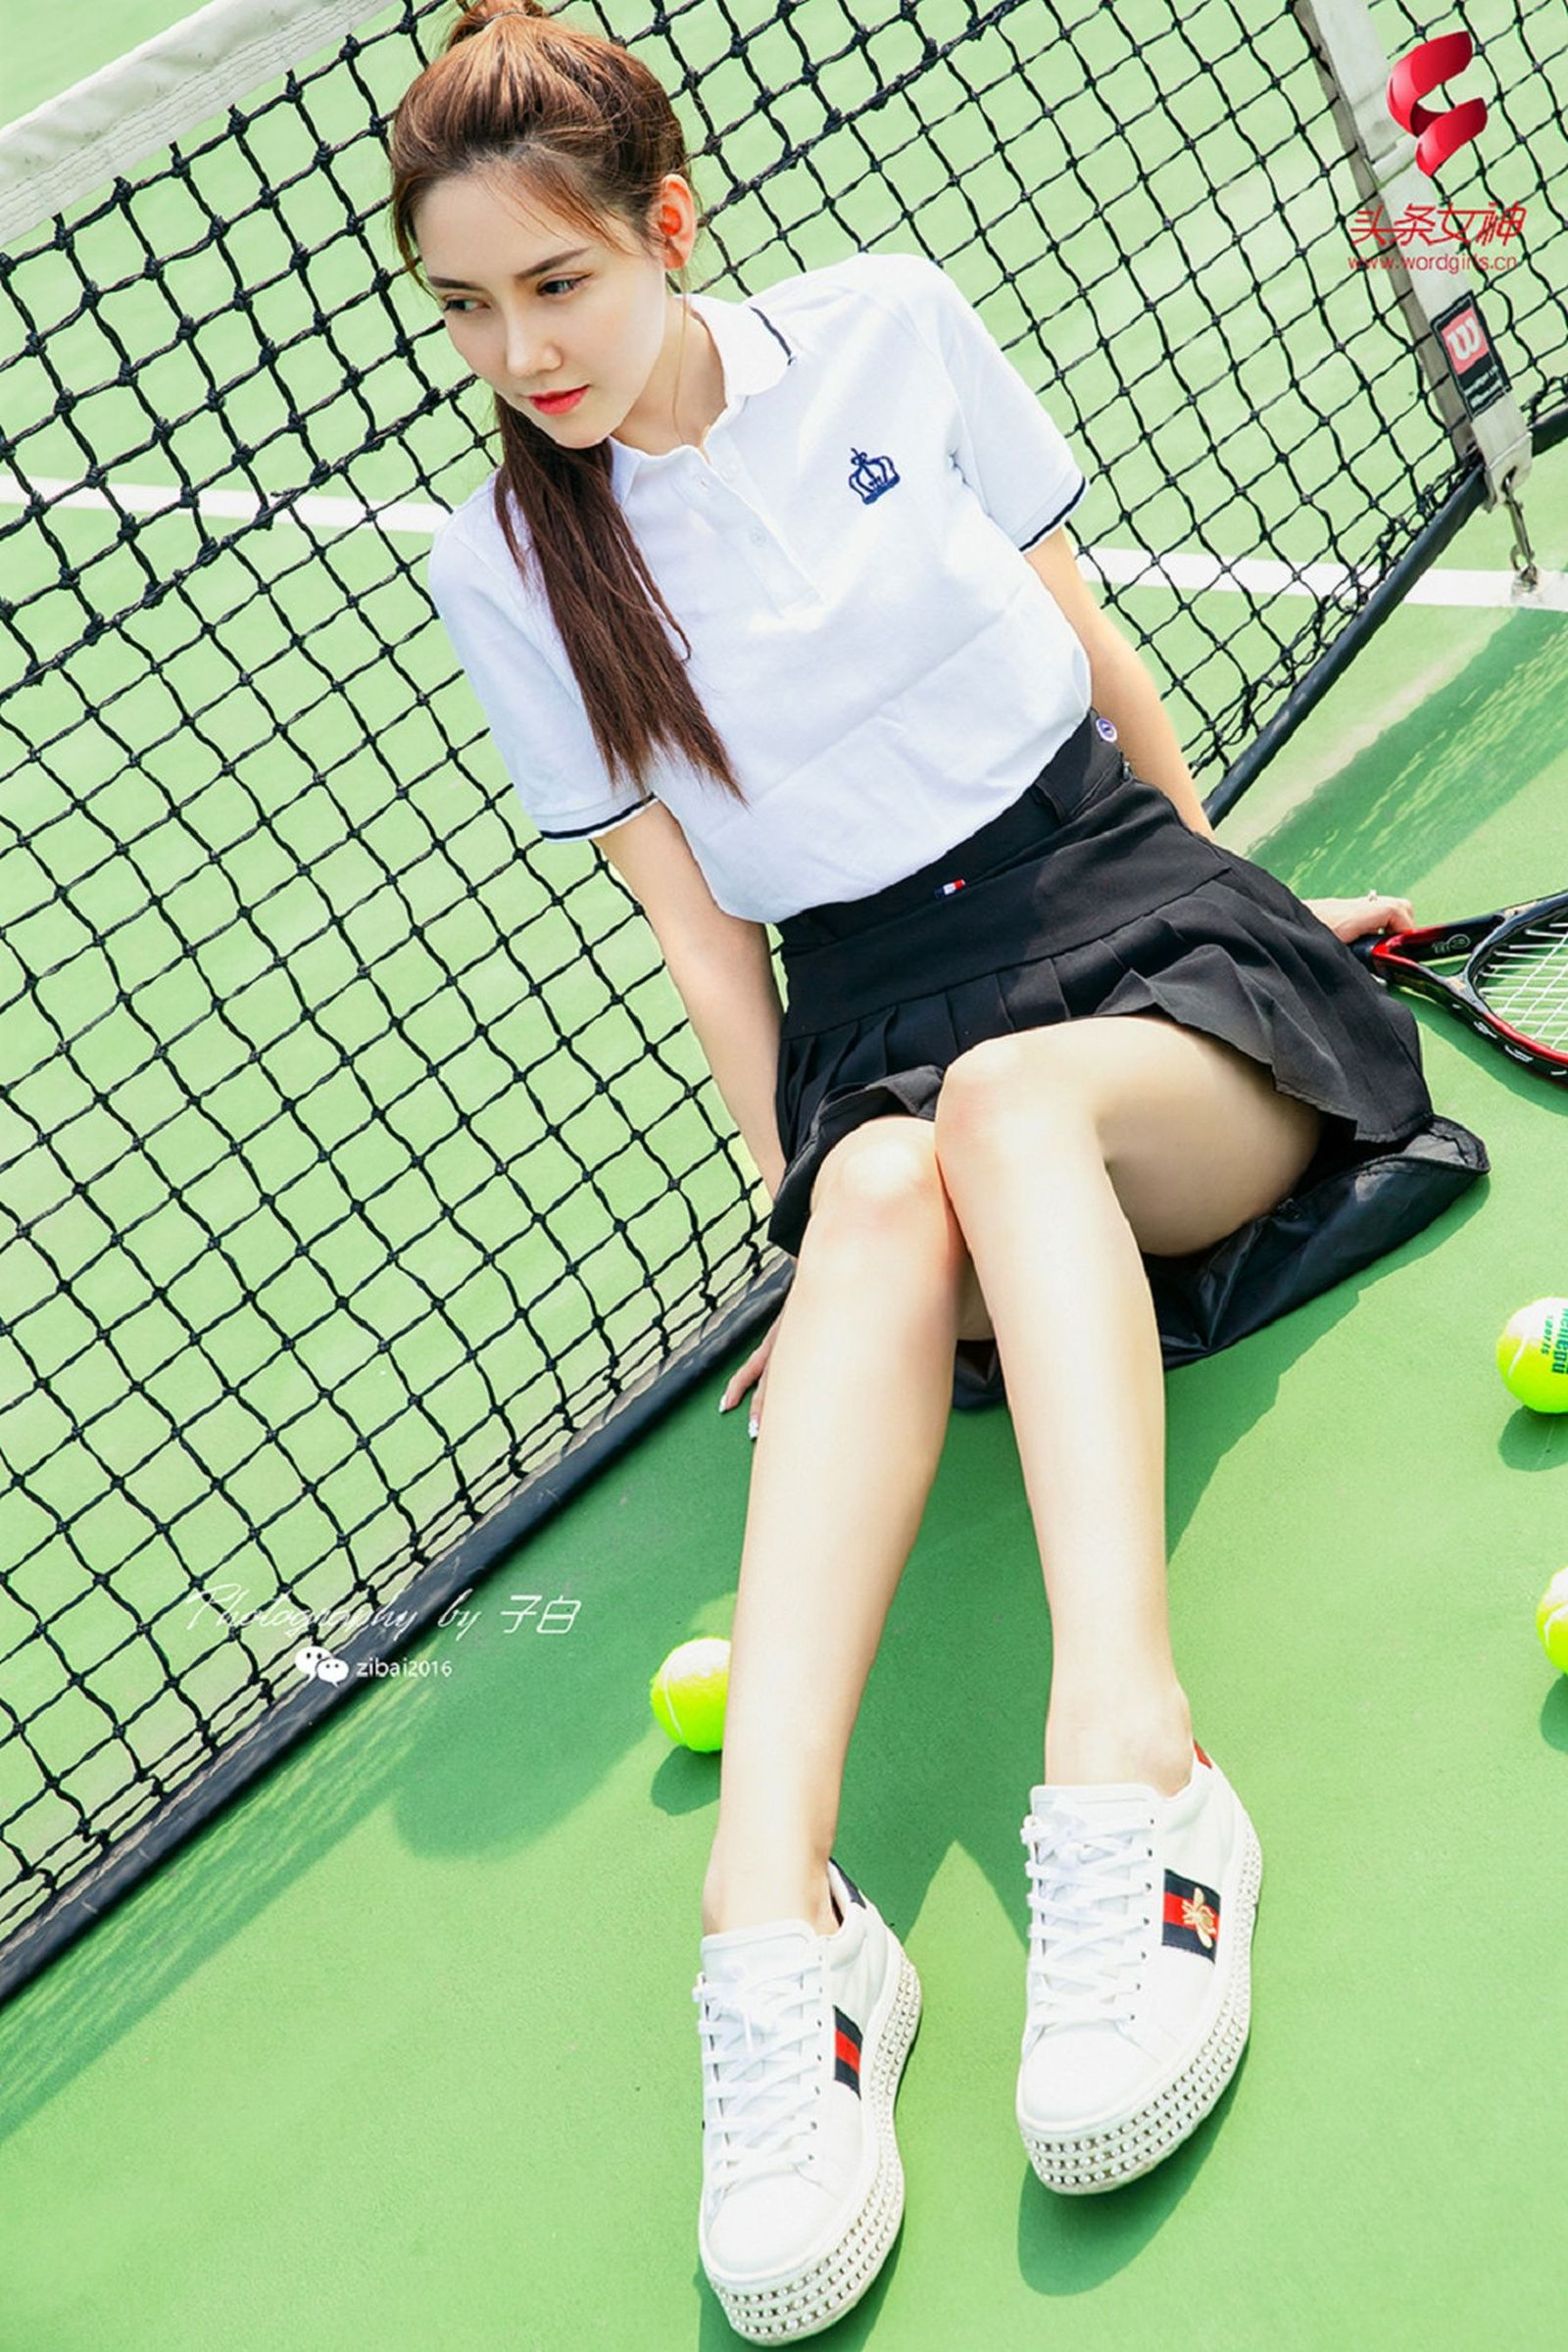 [TouTiao头条女神] 莎伦 - 我是网球美少女[22P]